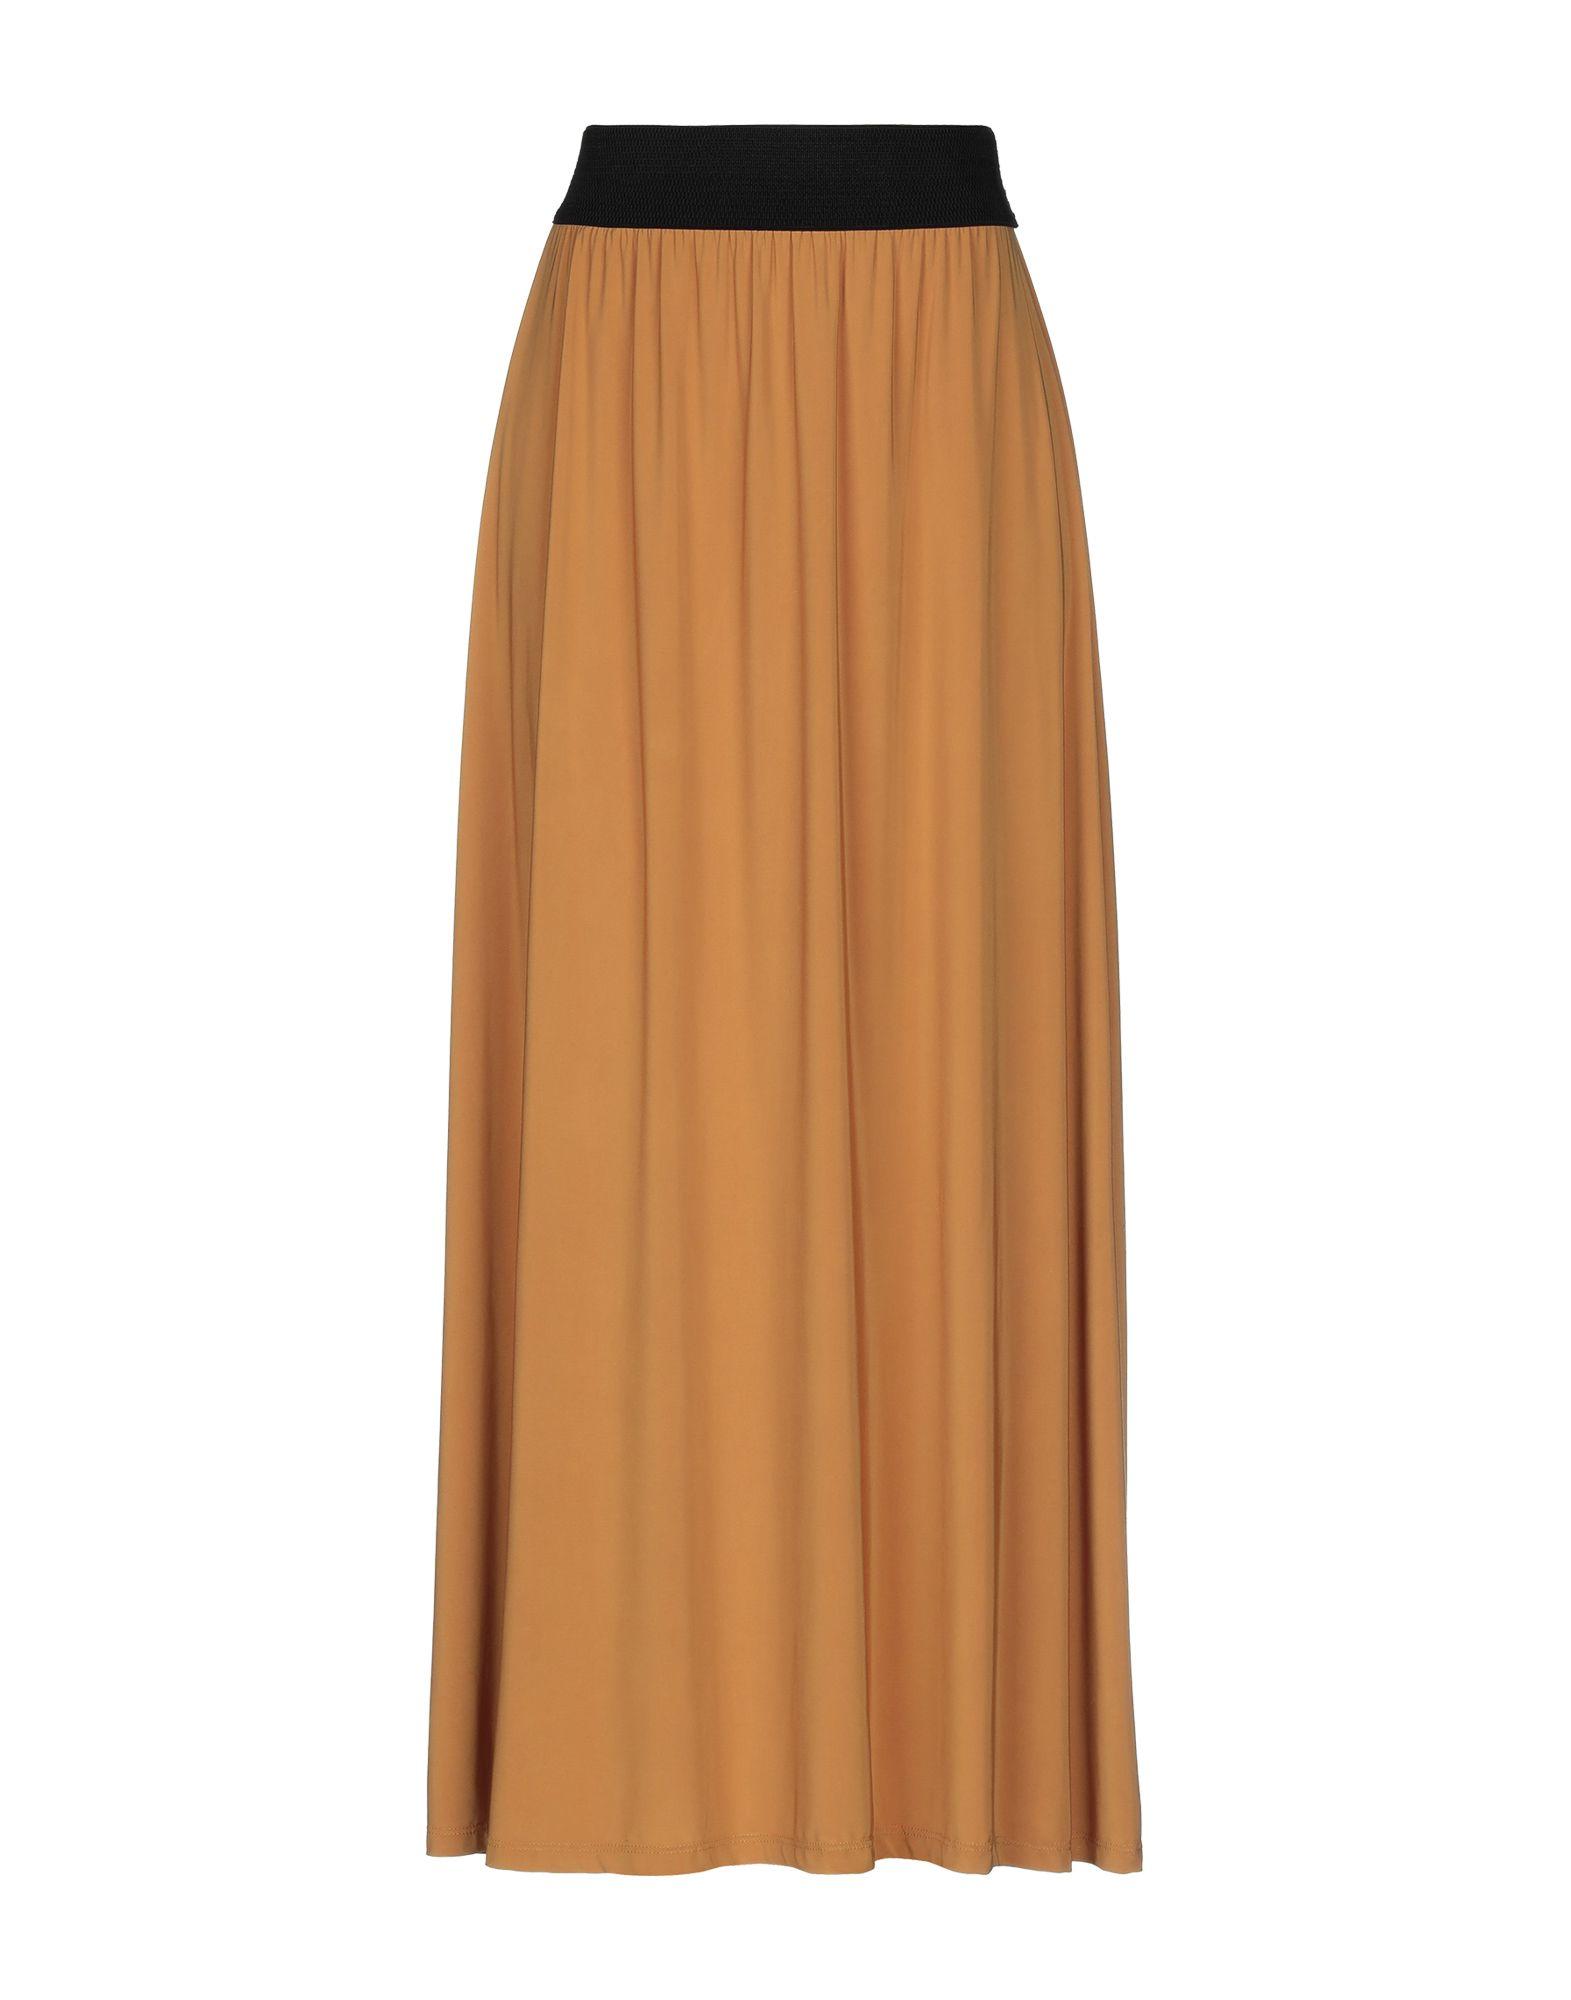 SISTE' S Длинная юбка юбка s cool юбка